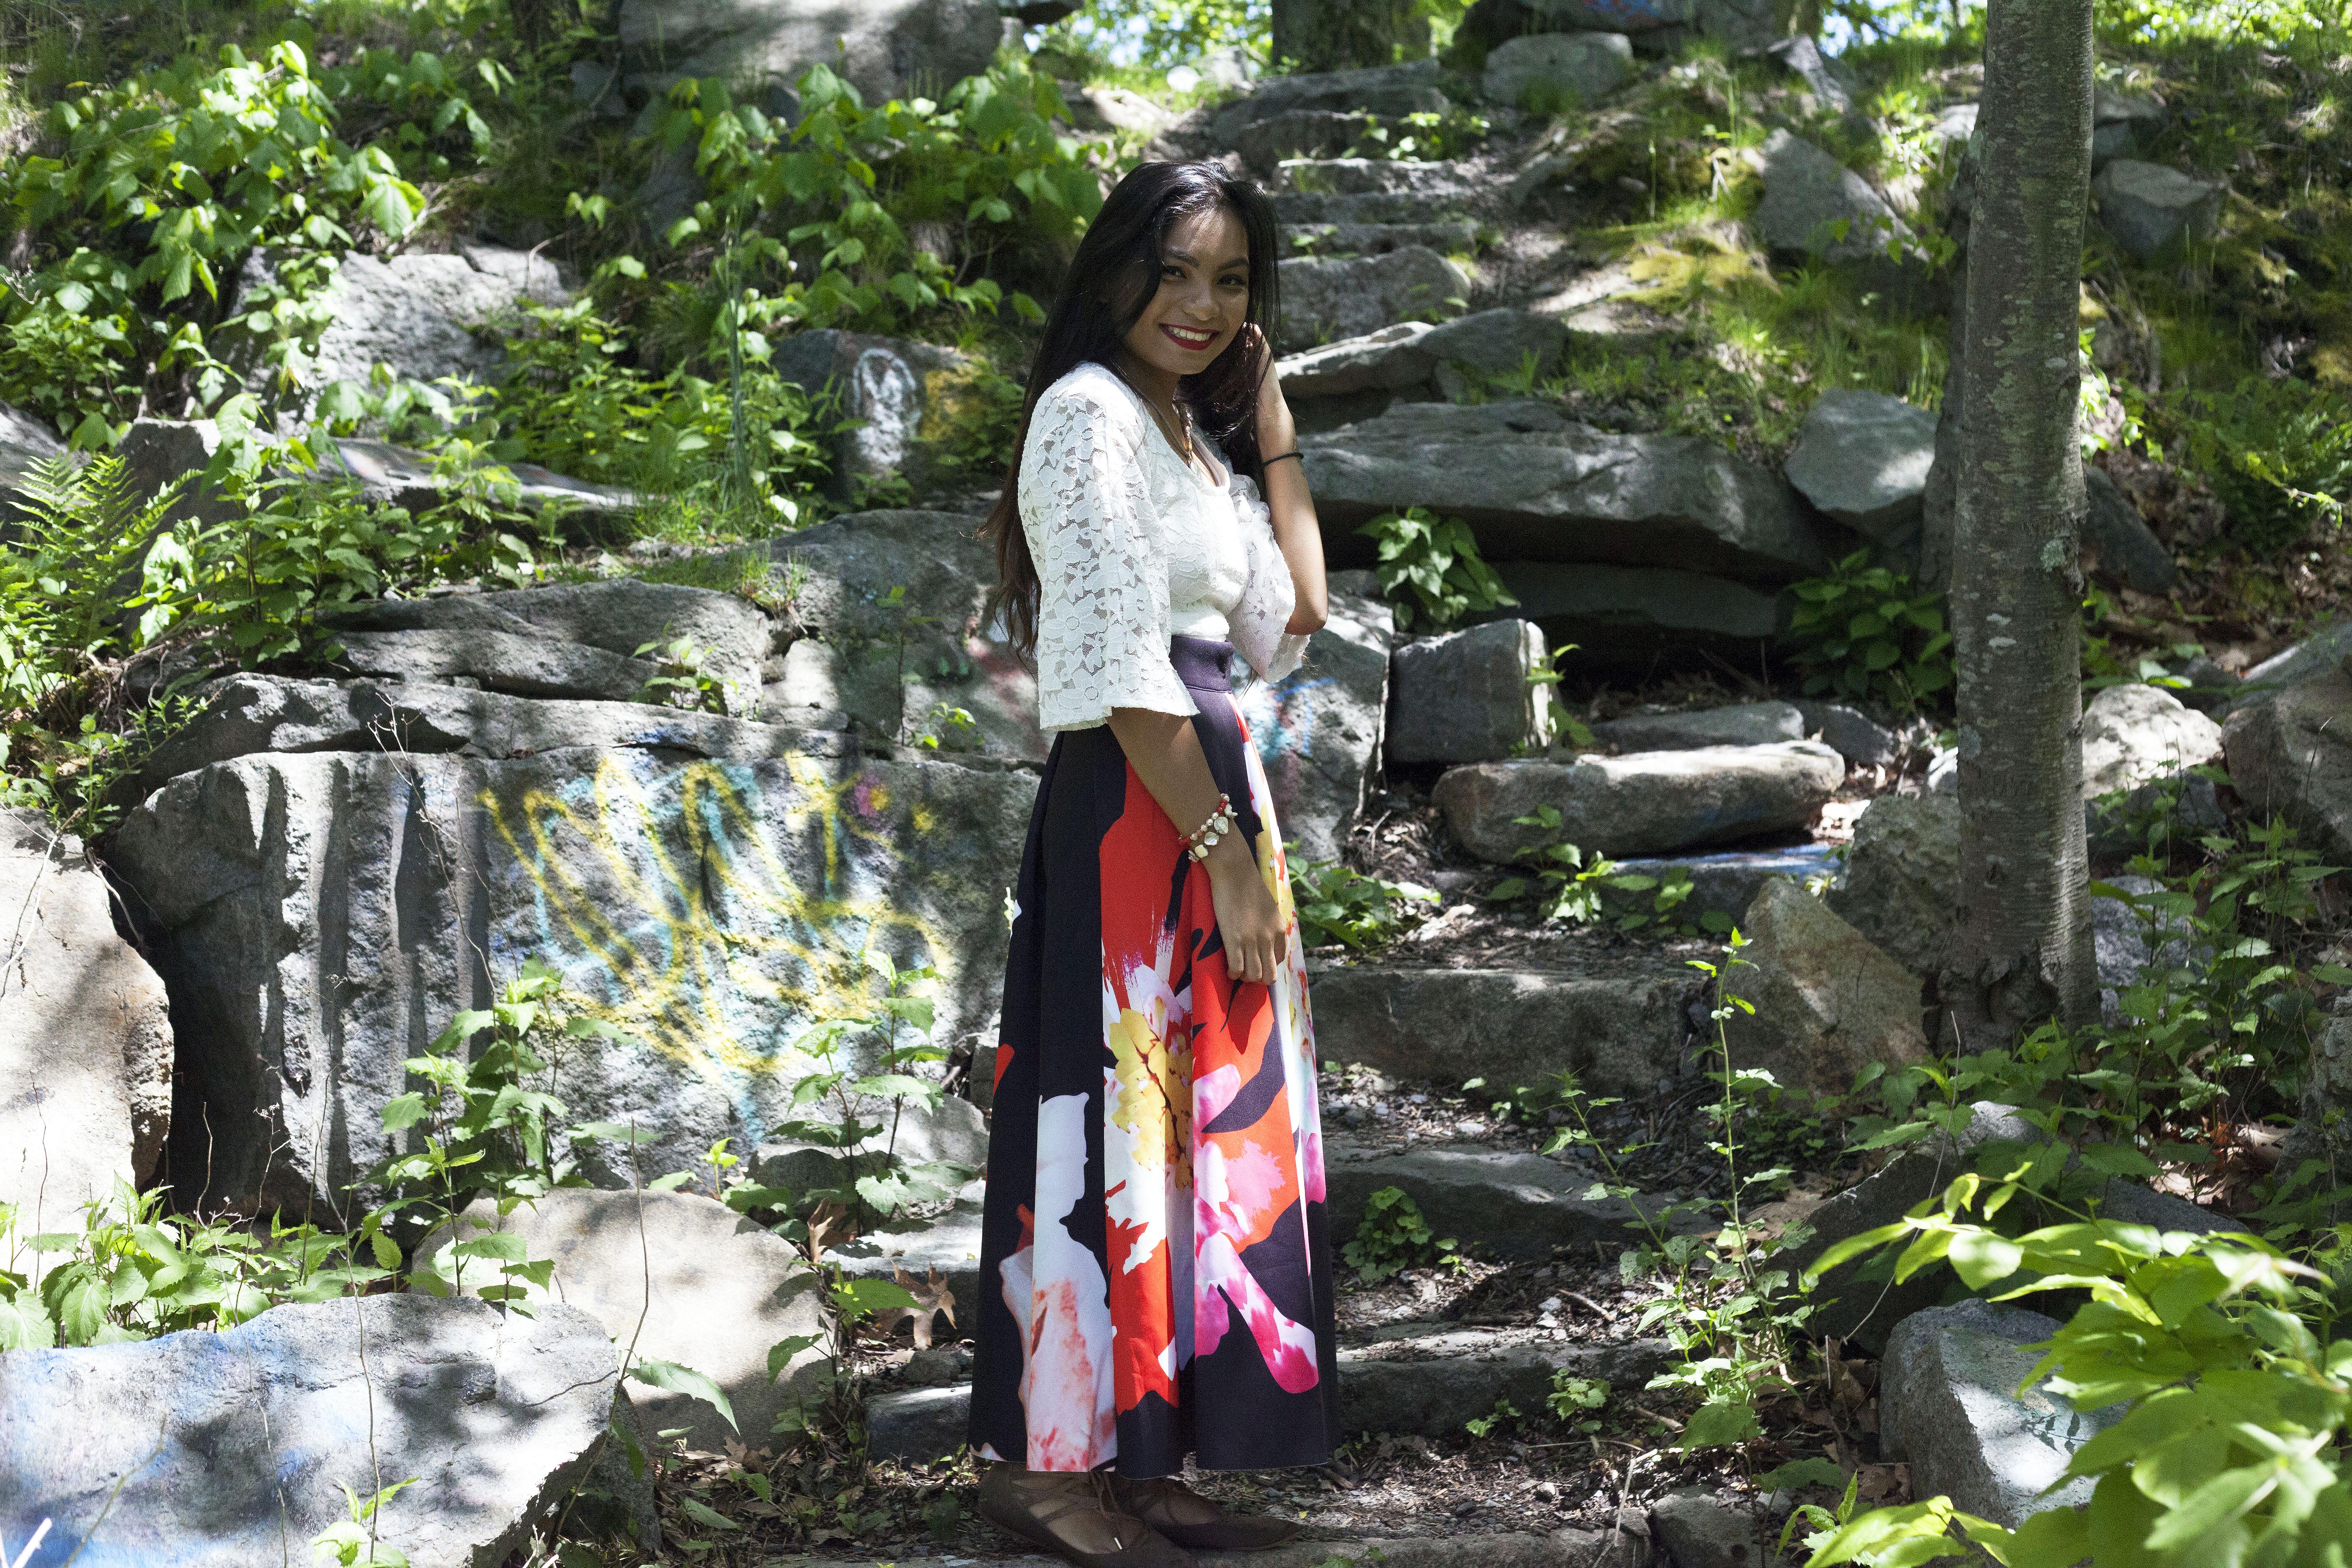 Shein-Floral-Maxi-Skirt-Lacey-Shirt-Fashionista-Style-Blogger-LINDATENCHITRAN-8-1616x1080